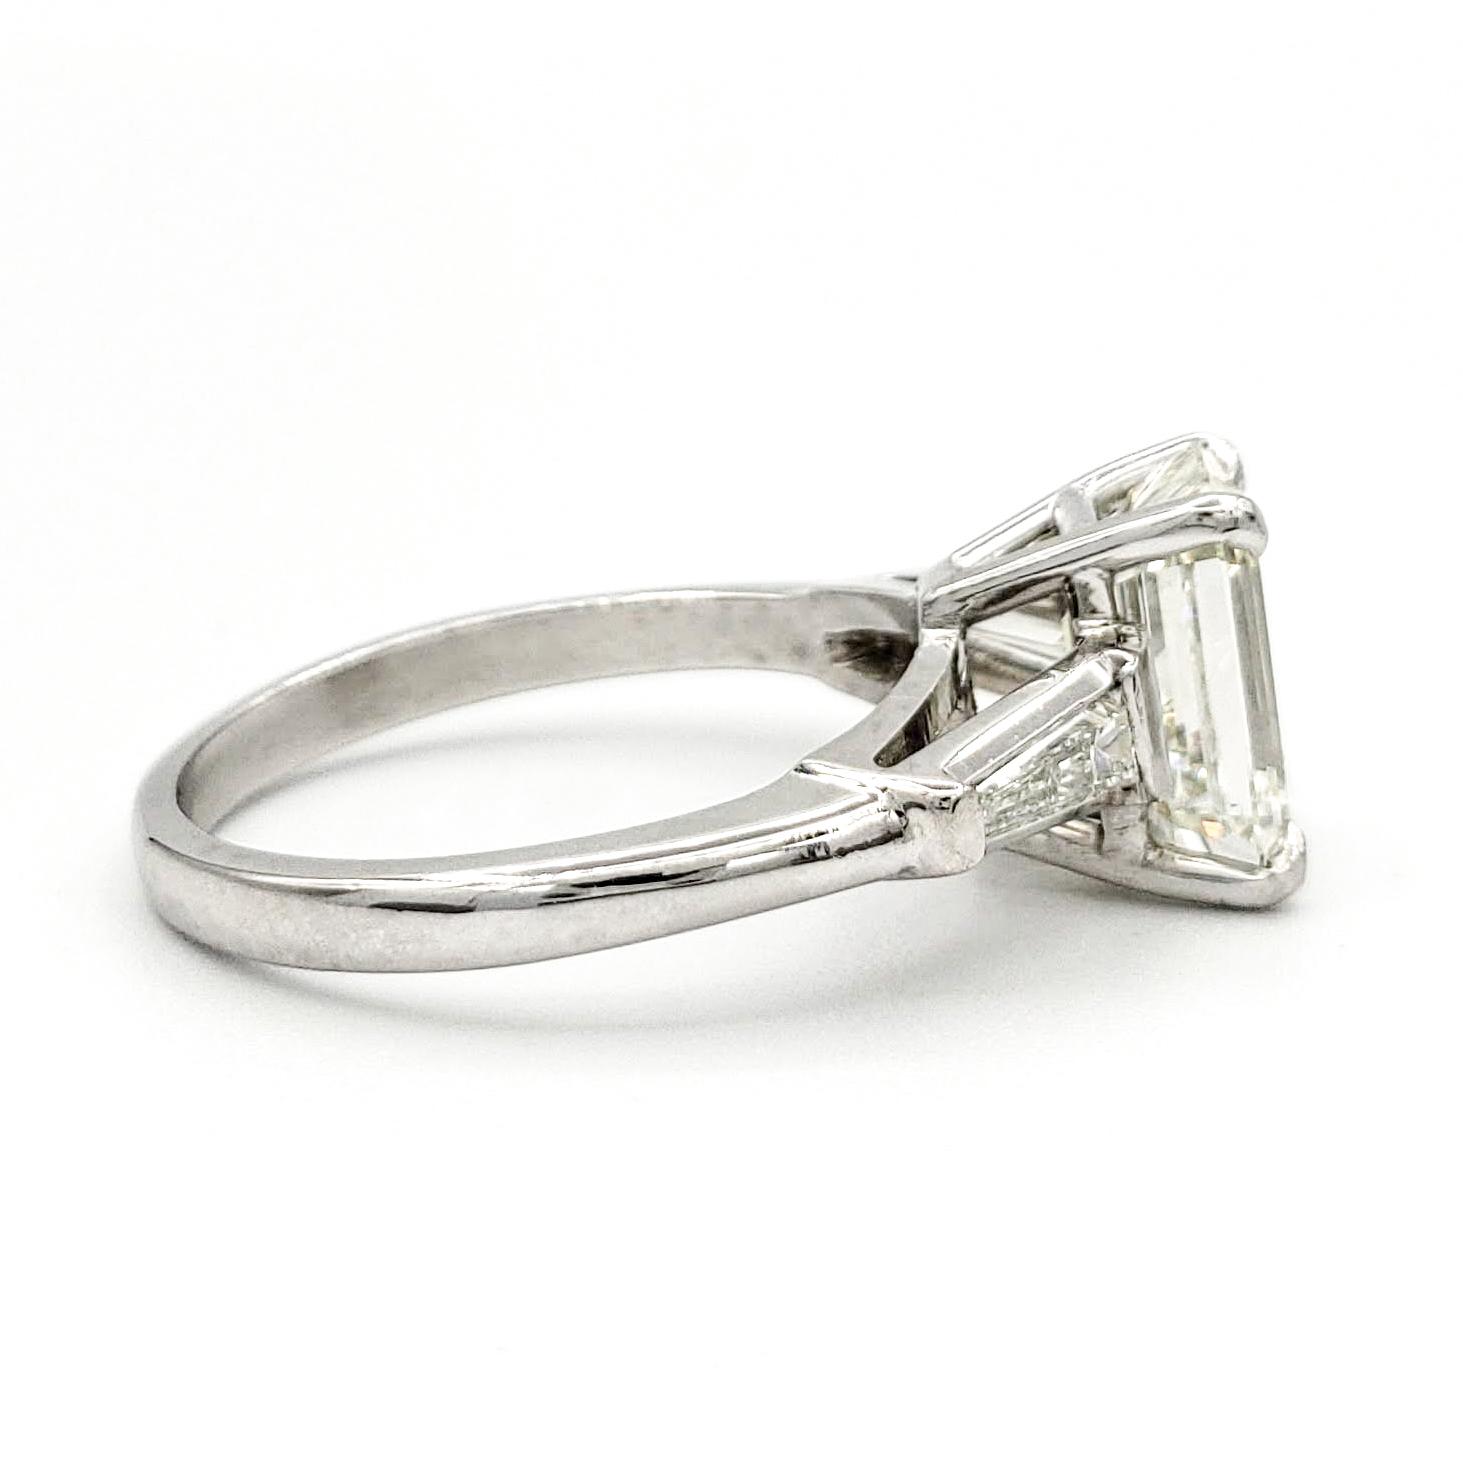 vintage-platinum-engagement-ring-with-2-30-carat-emerald-cut-diamond-gia-m-vs2